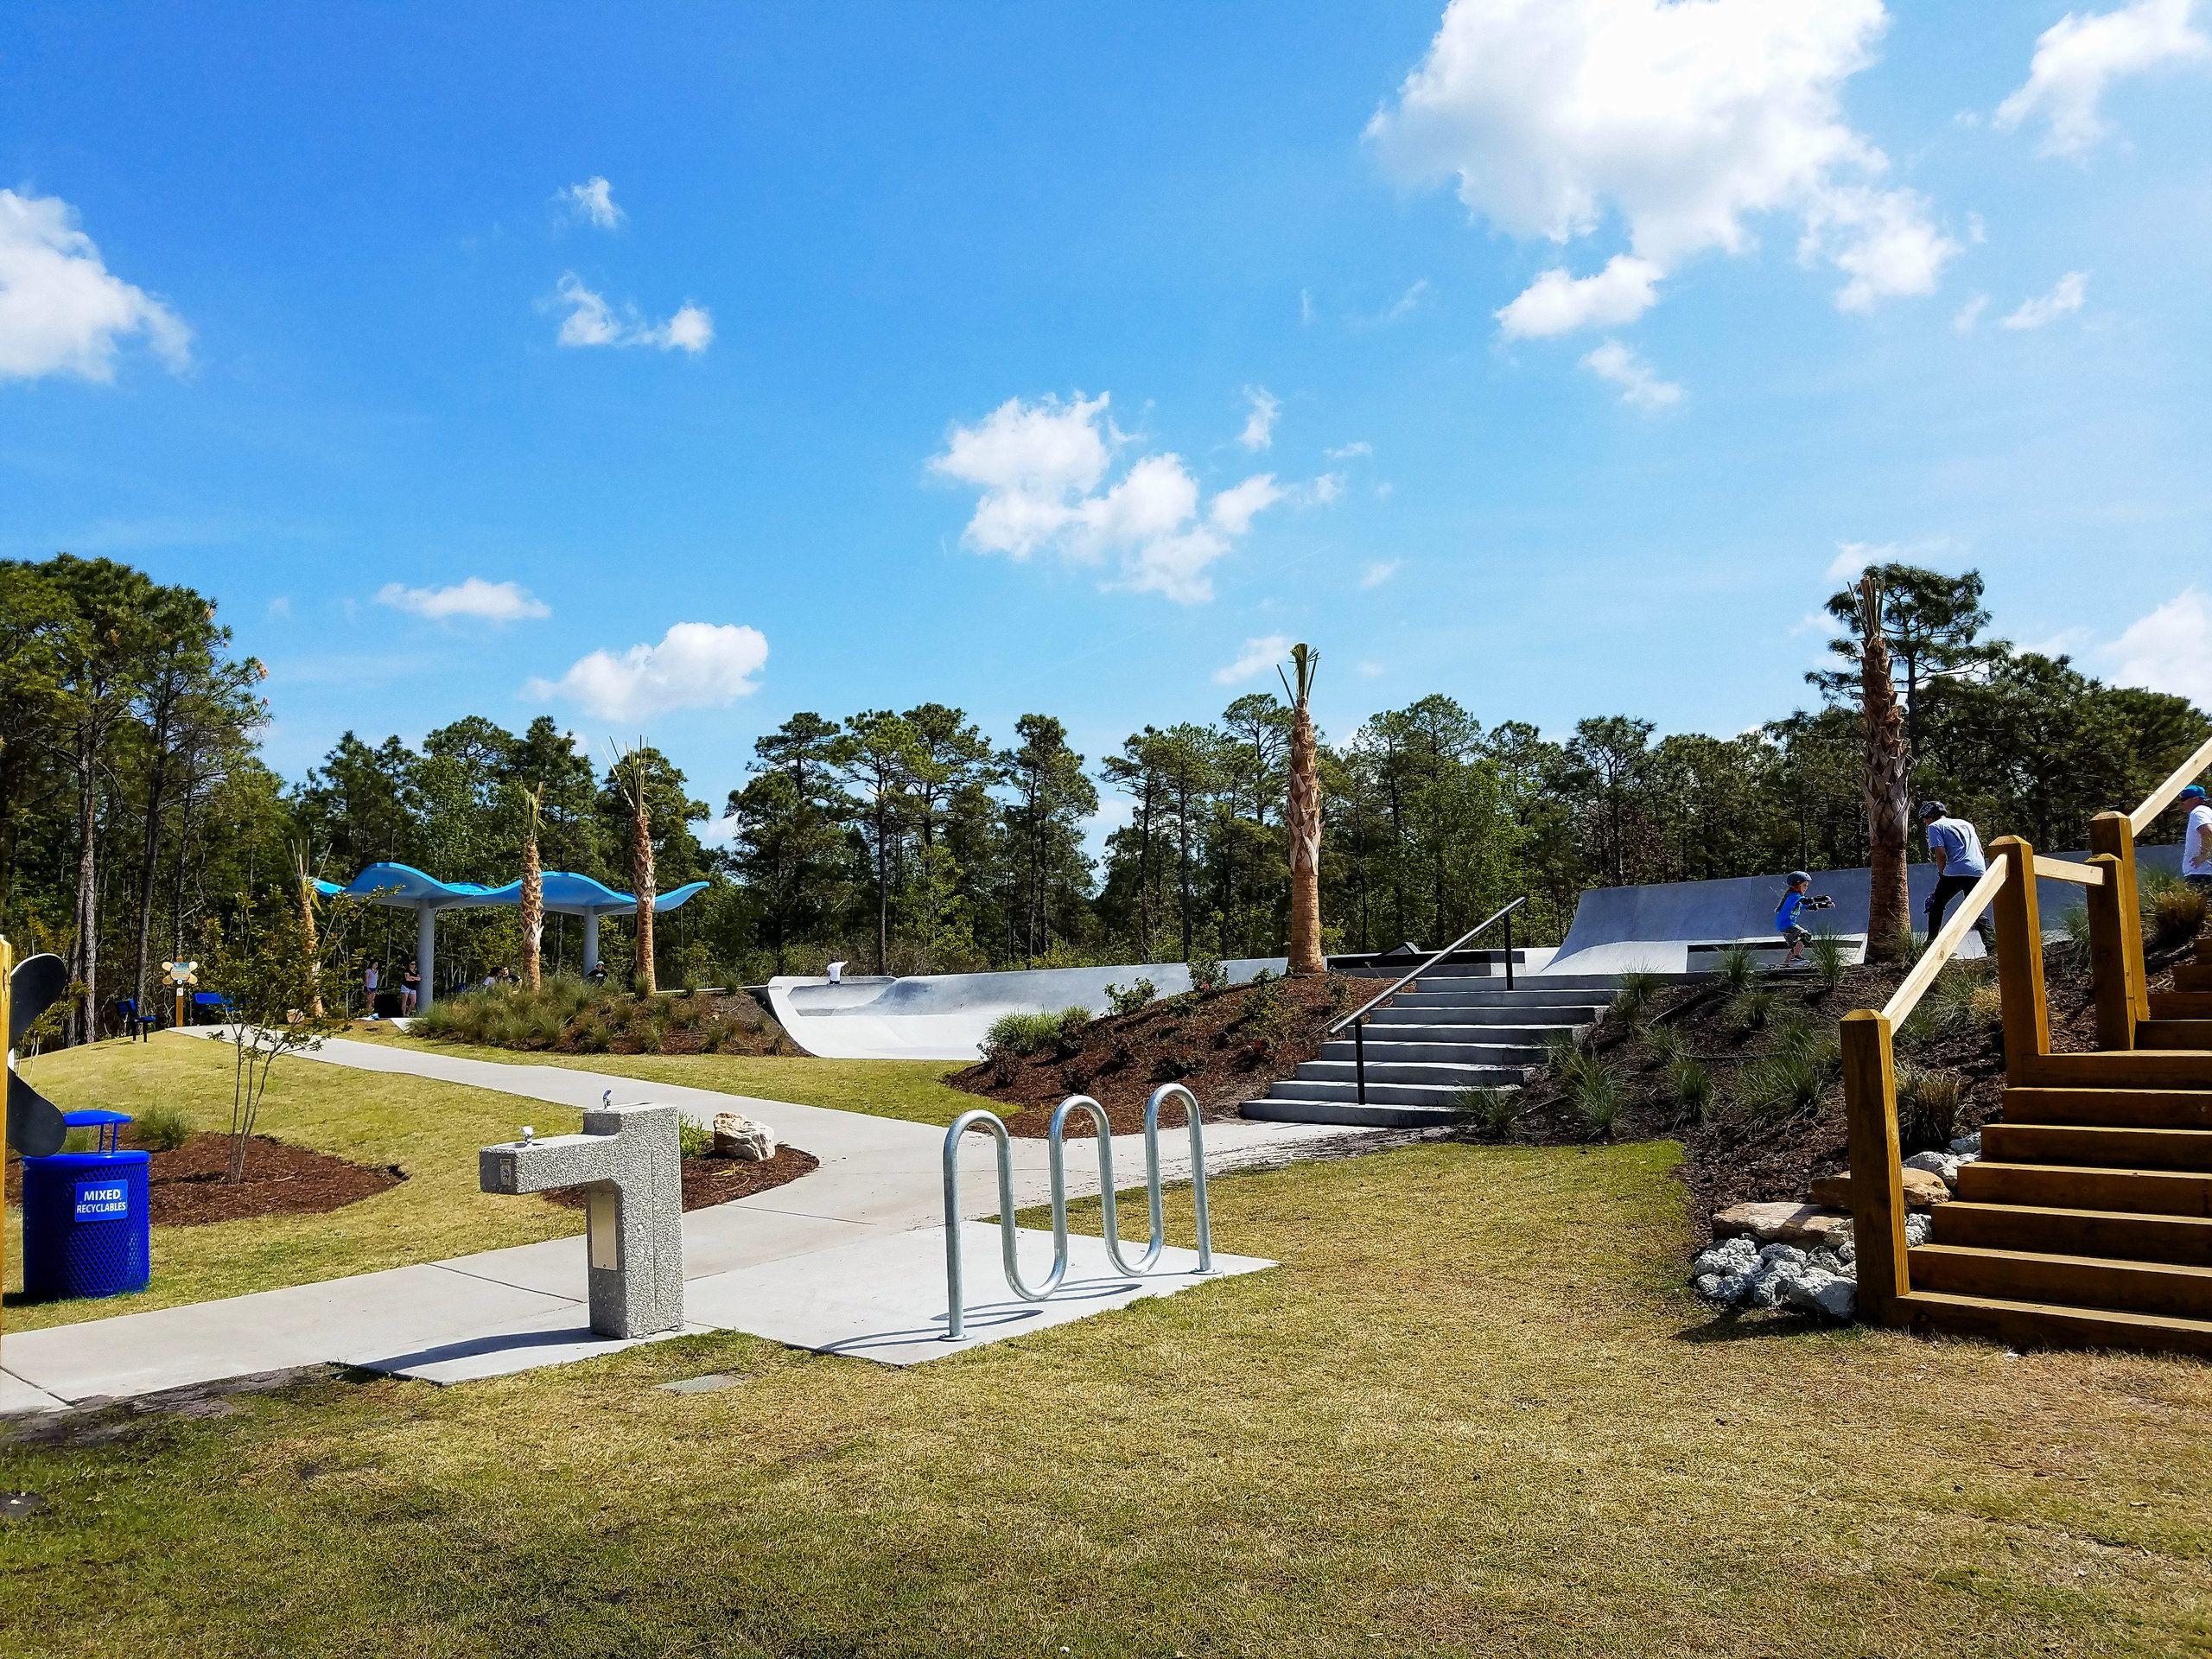 Ogden Skatepark